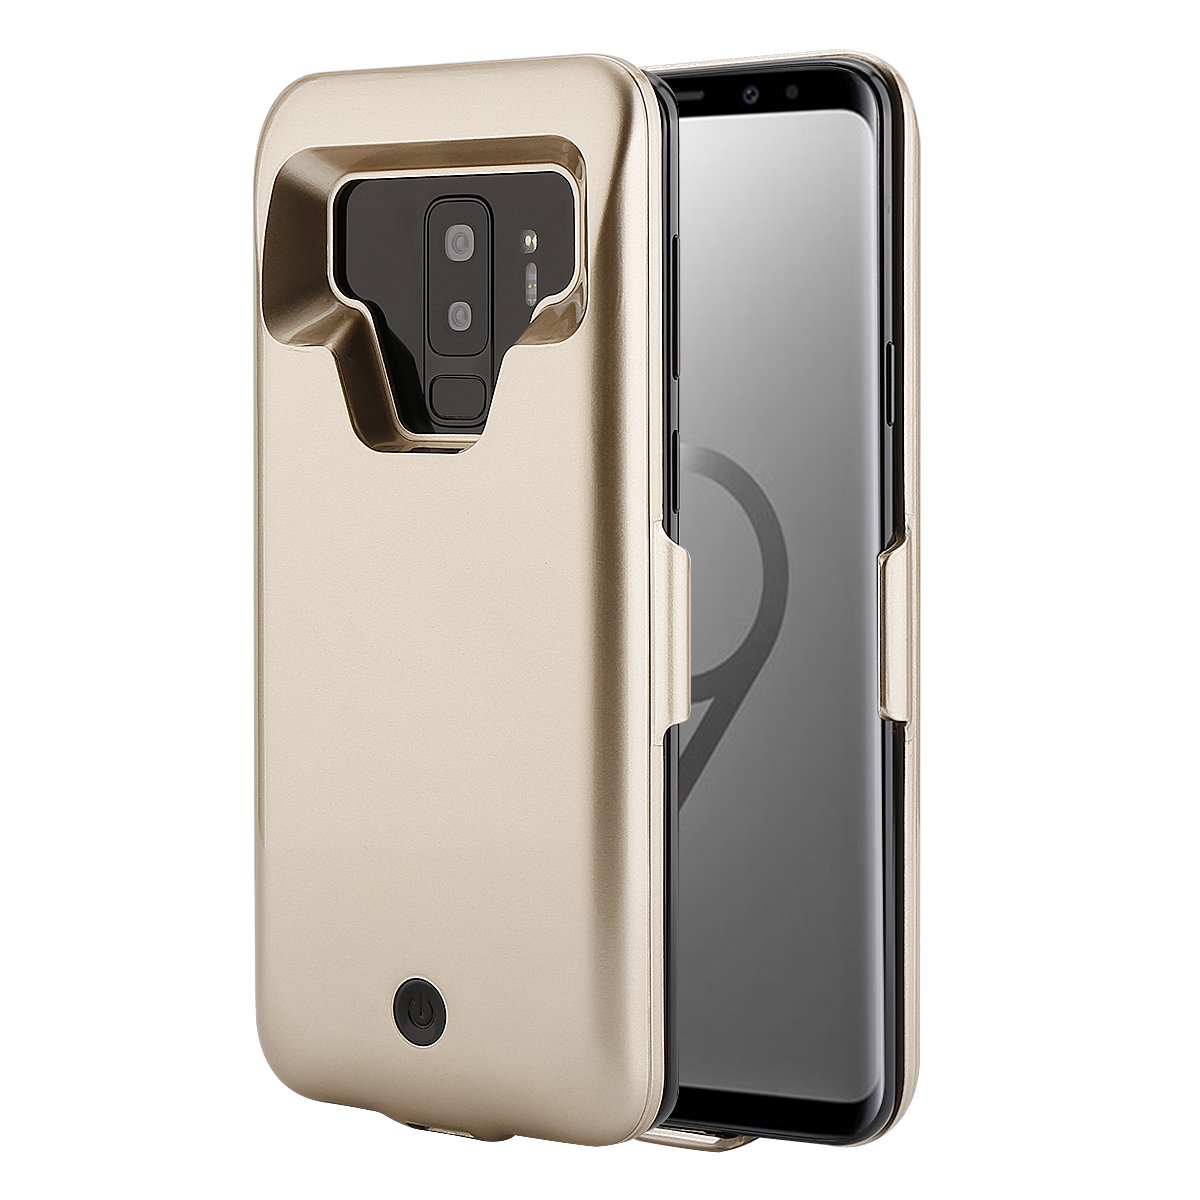 Amazon.com: Scheam Samsung Galaxy S8 Plus Battery Case ...